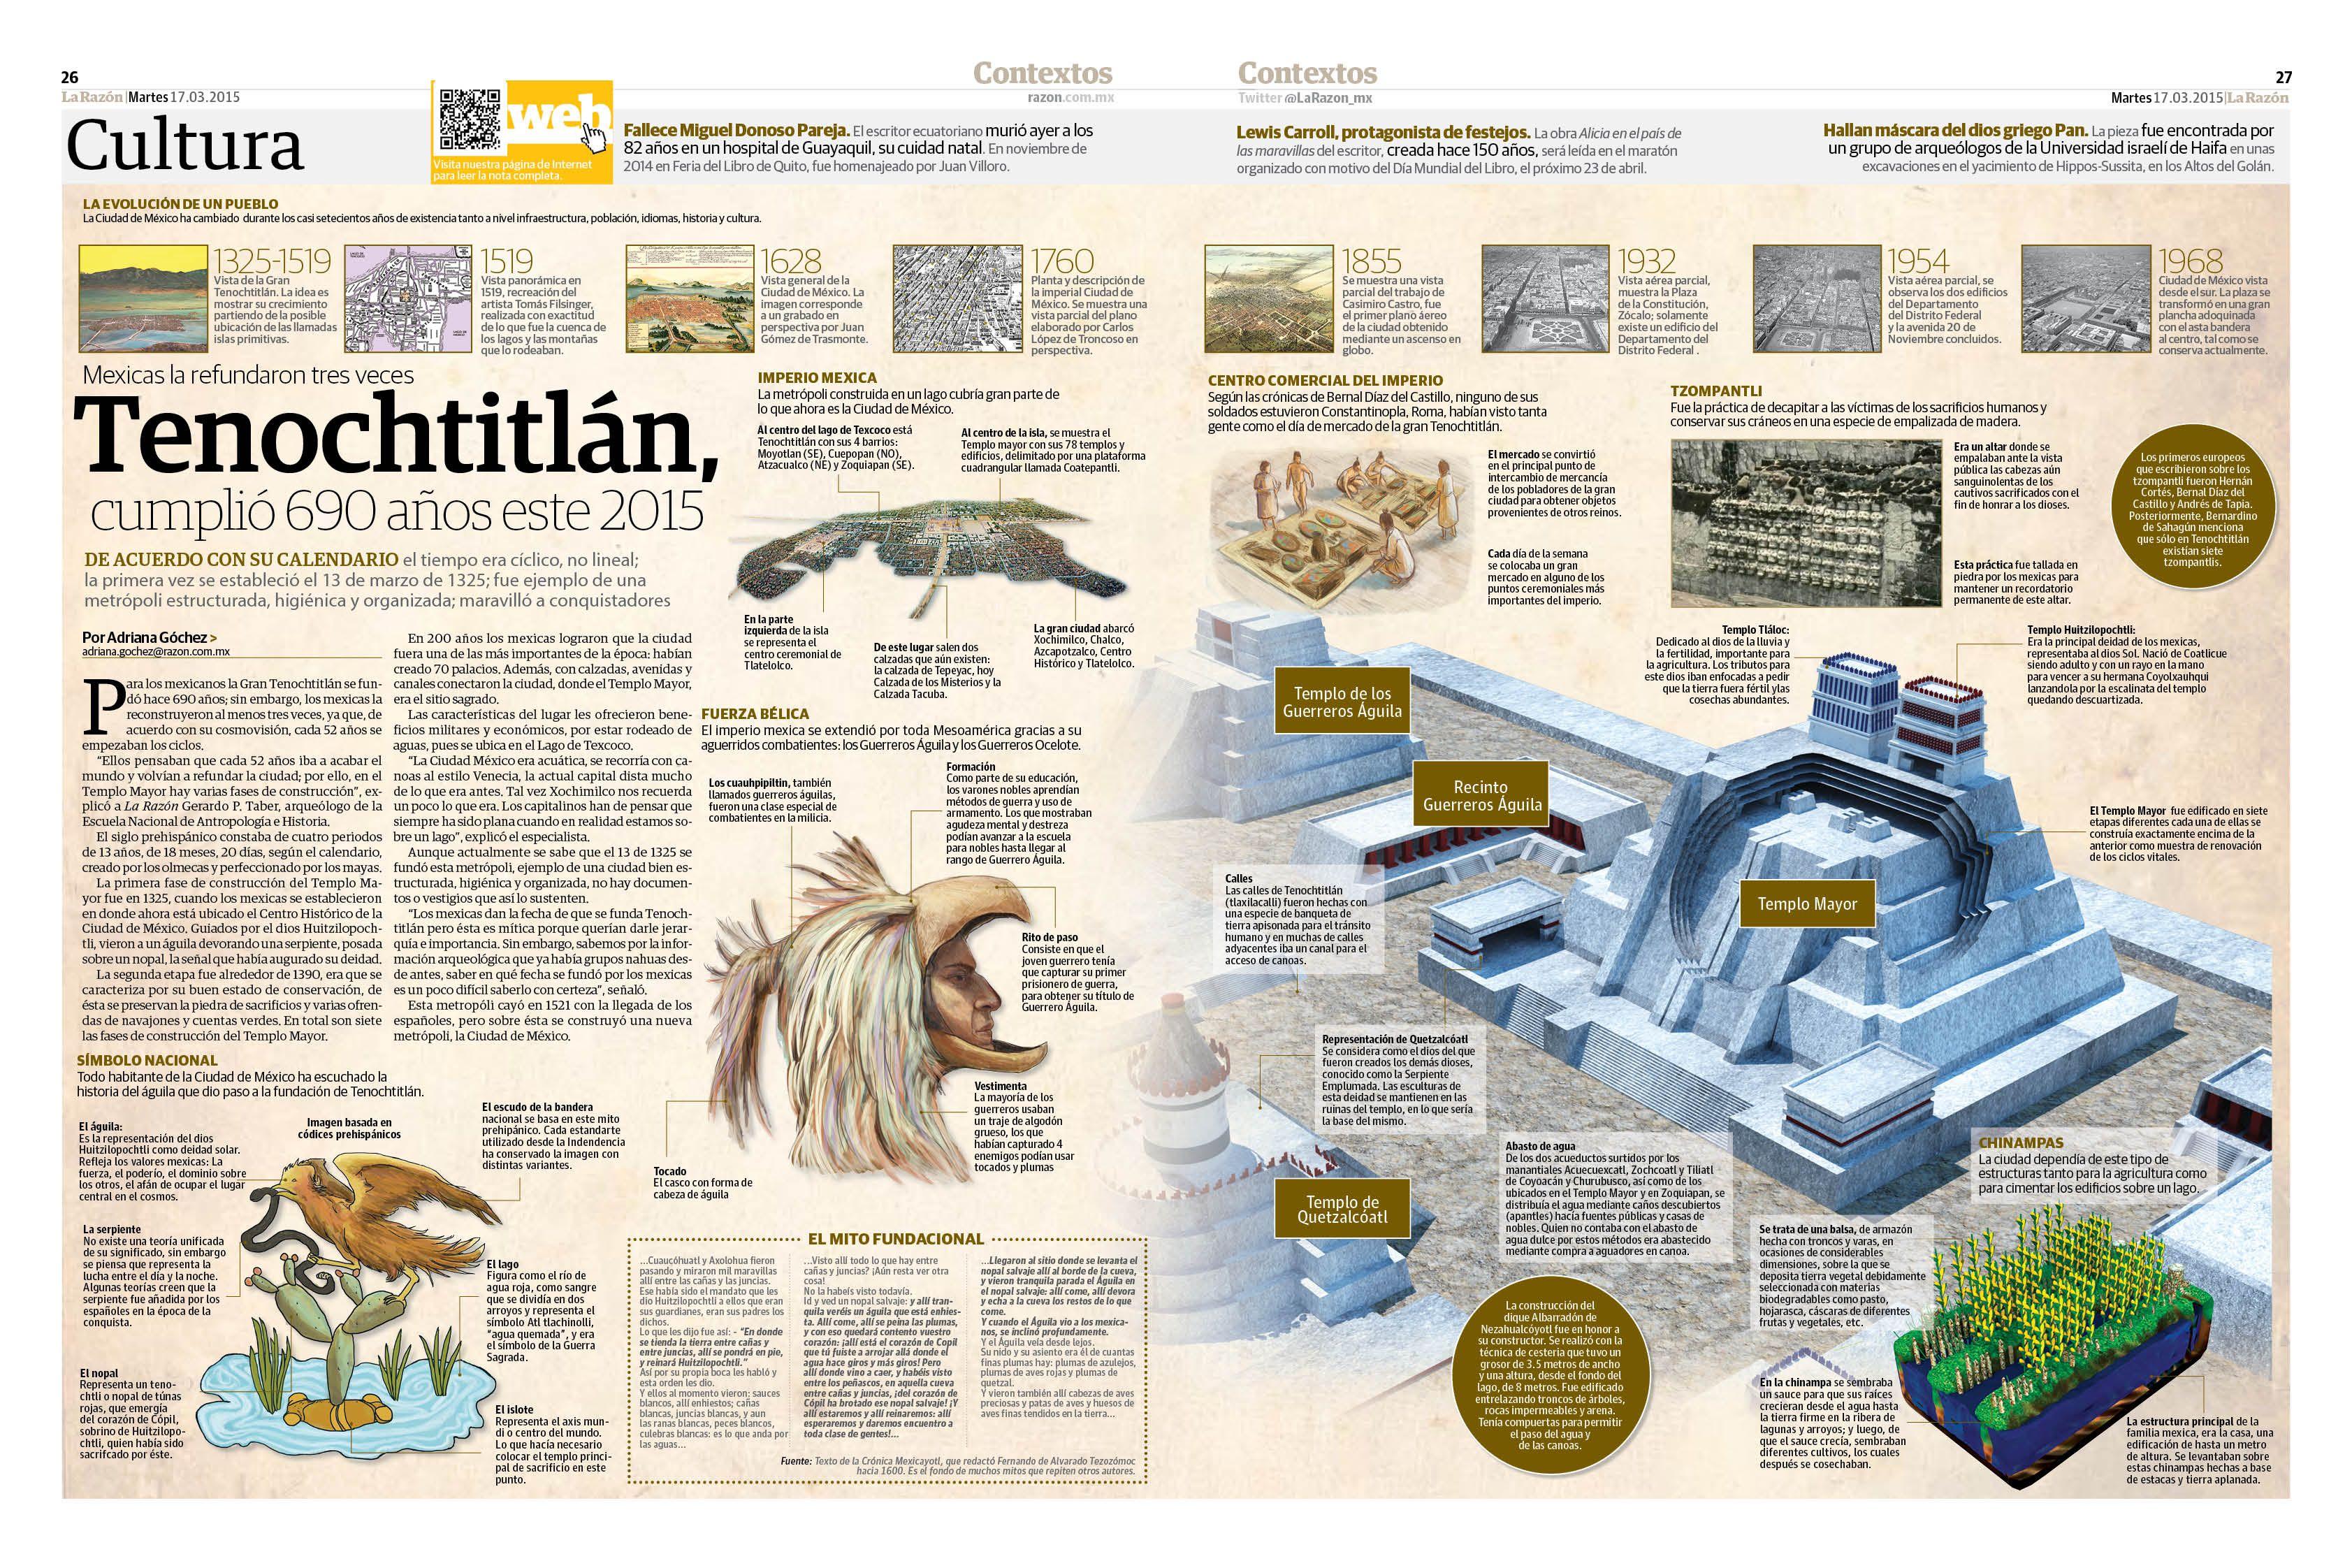 This Is Visual Journalism 107 Visualoop History Ancient Knowledge Visual